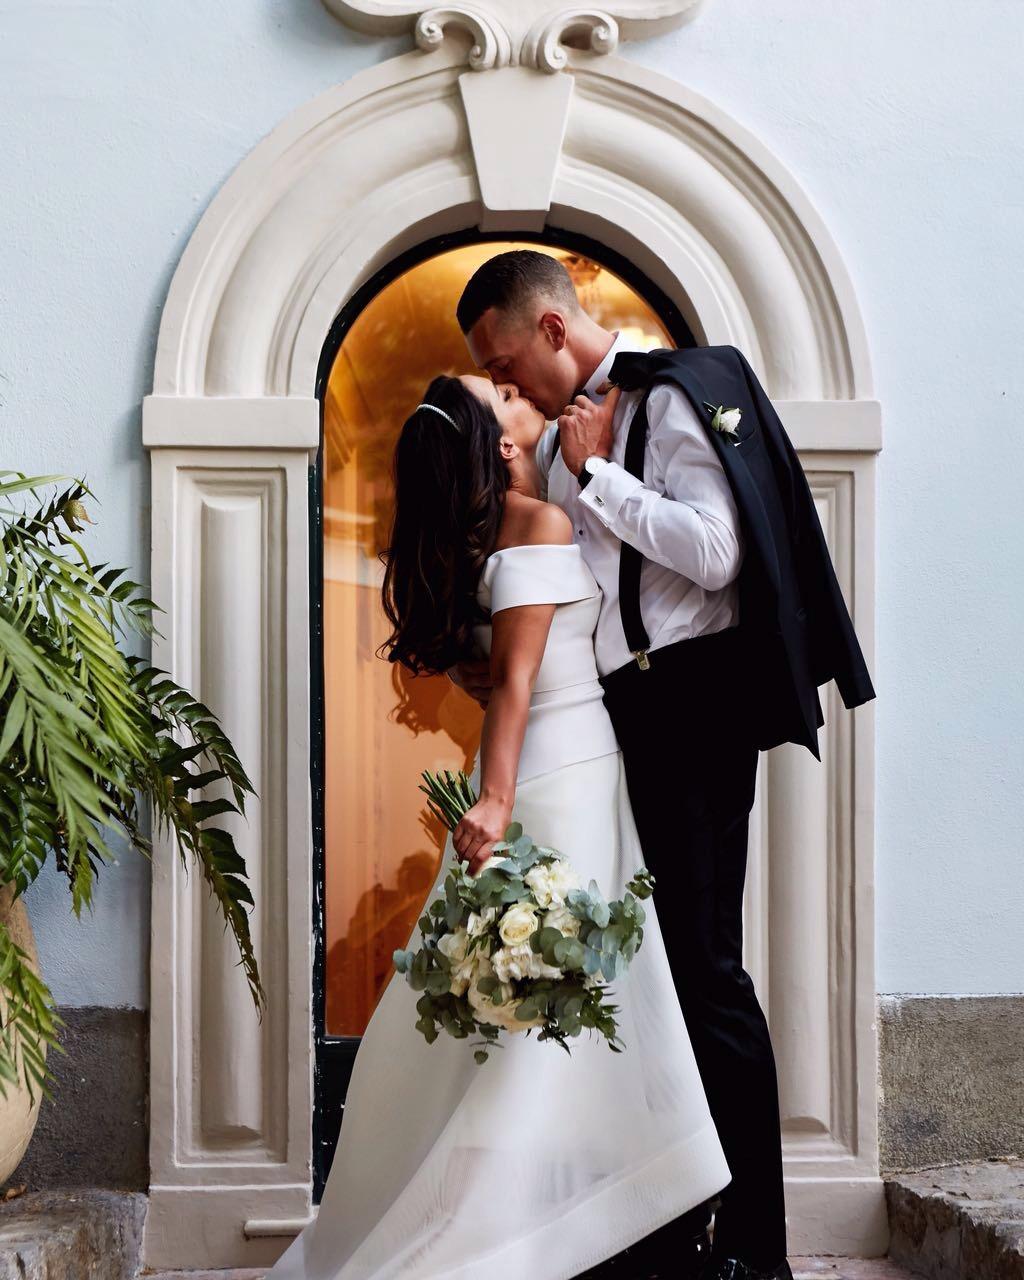 https://www.weddingamalfi.com/wp-content/uploads/Laura-and-Jarrod-bride-and-groom-kissing.jpg